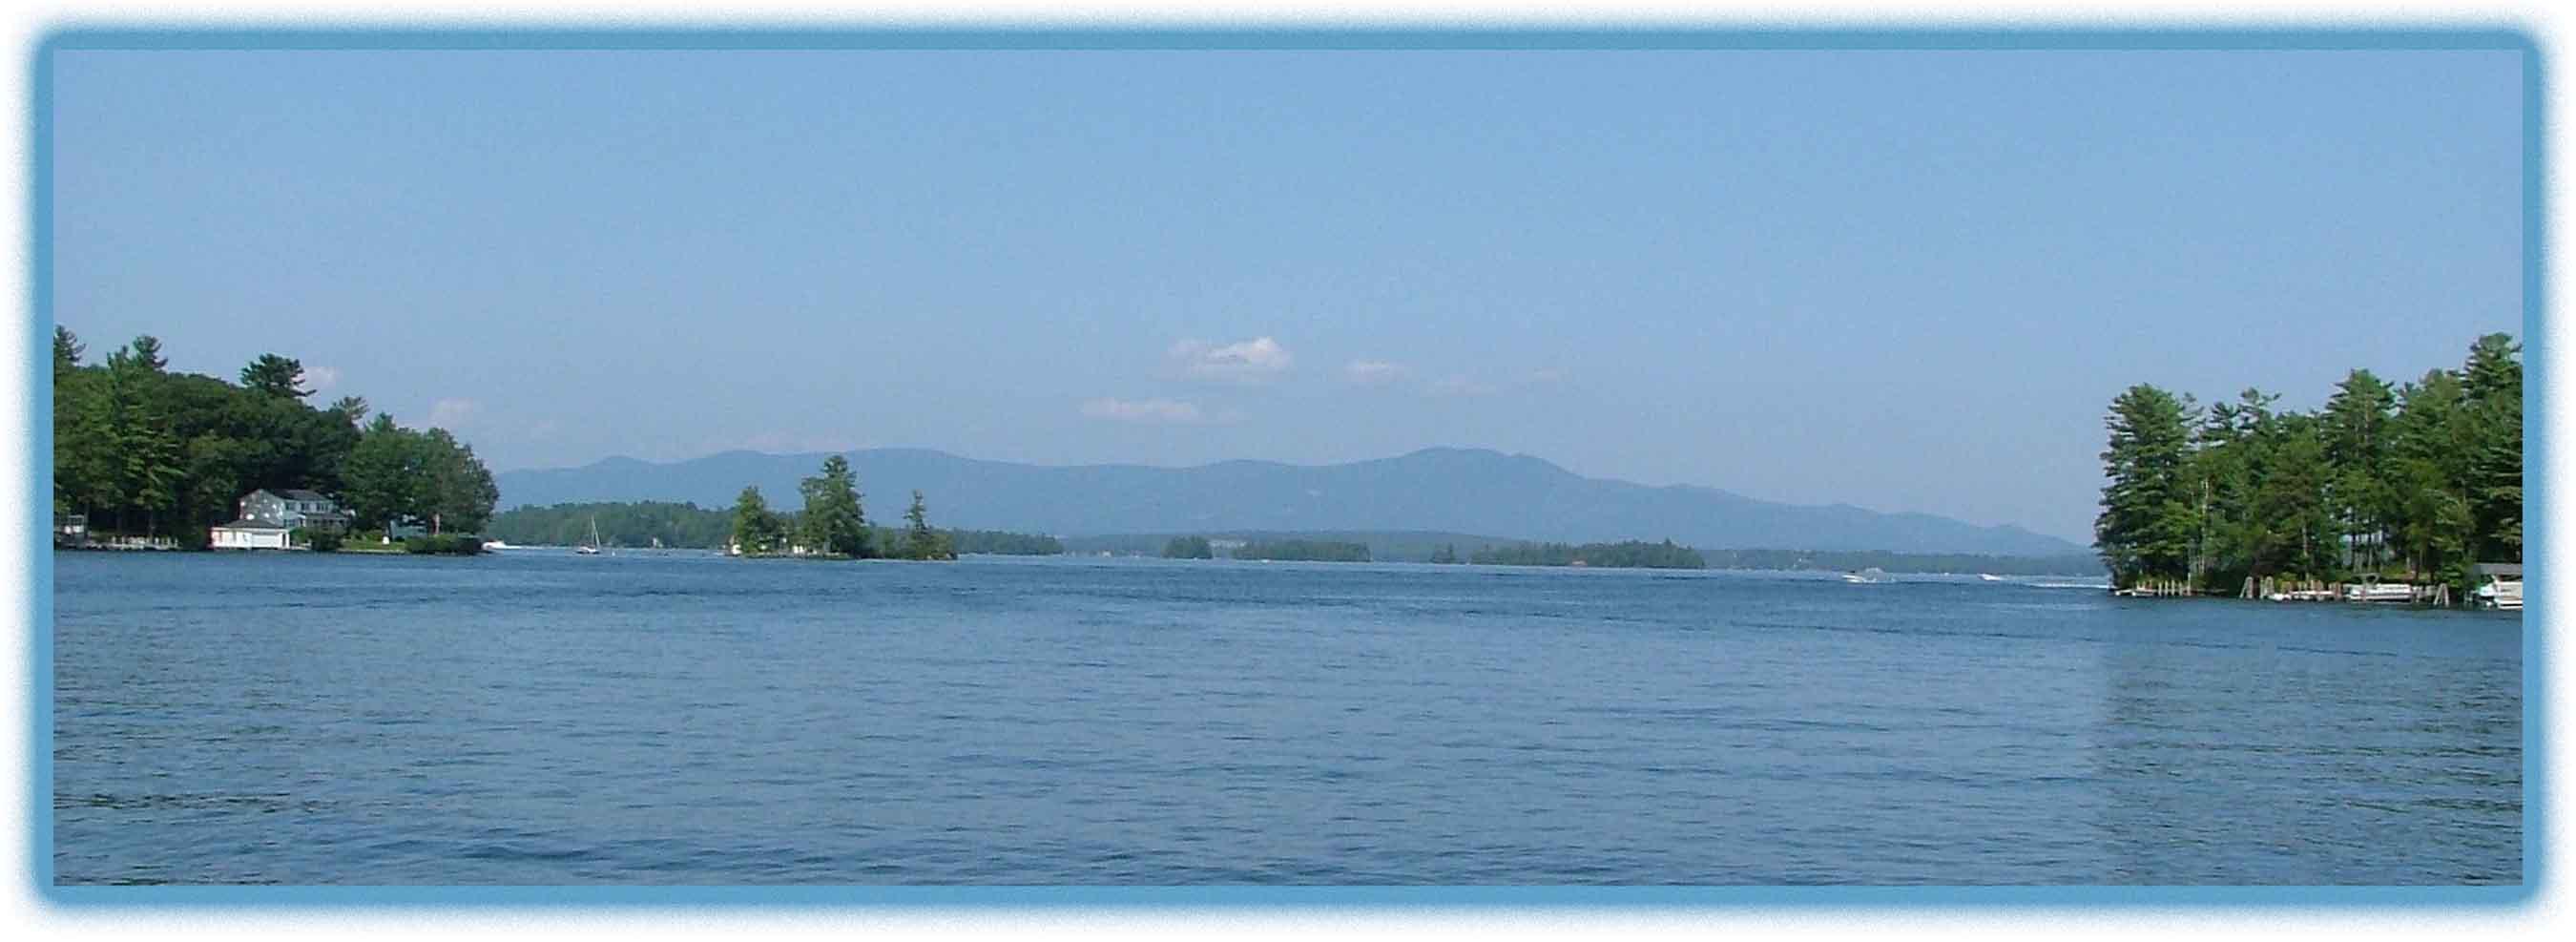 Lake Winnipesaukee Vacation